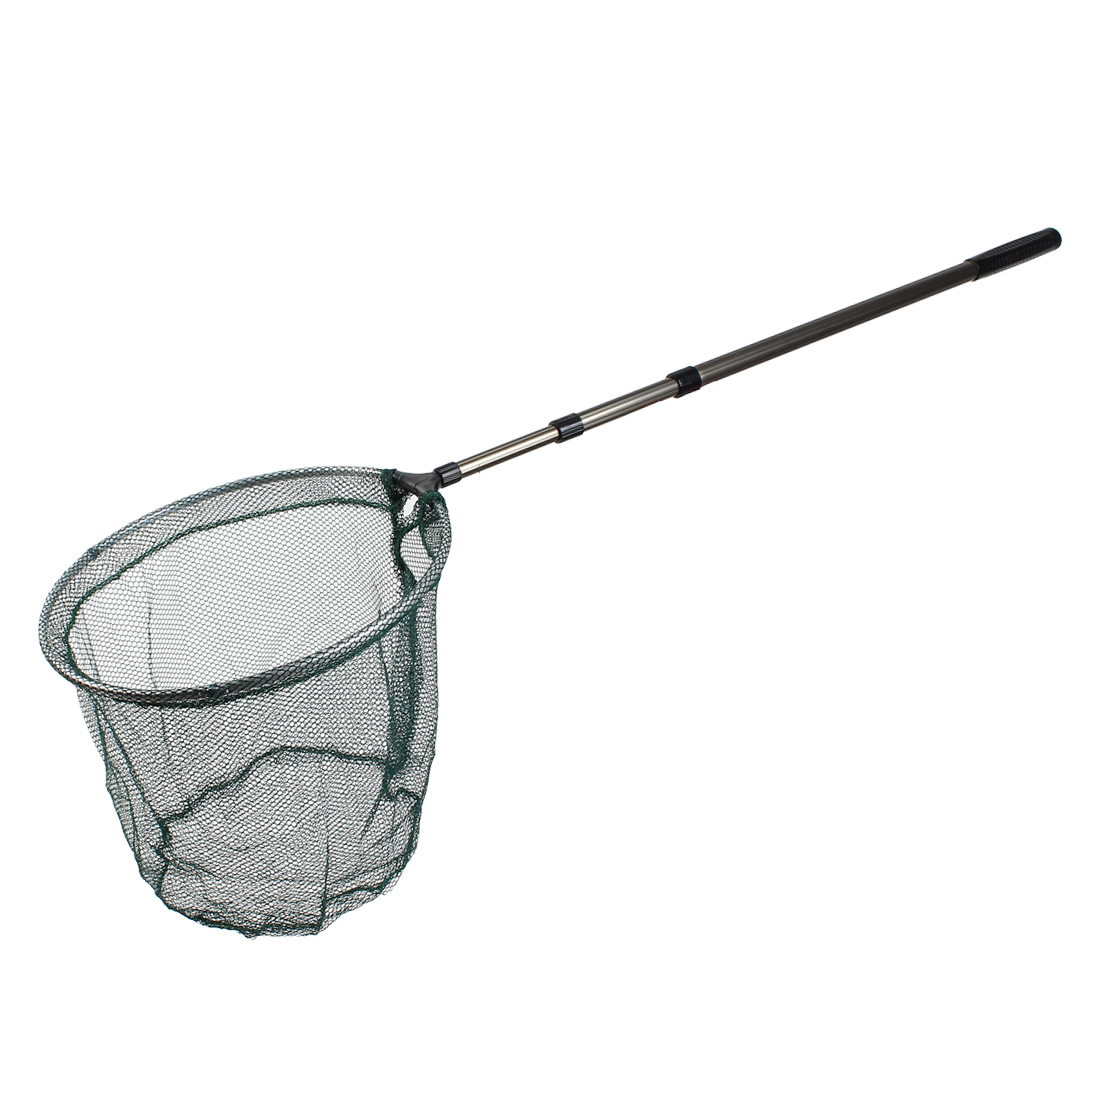 5ft 147cm Long Retractable Pole 3 Section Folding Handle Fishing Landing Net Fish Mesh Tackle